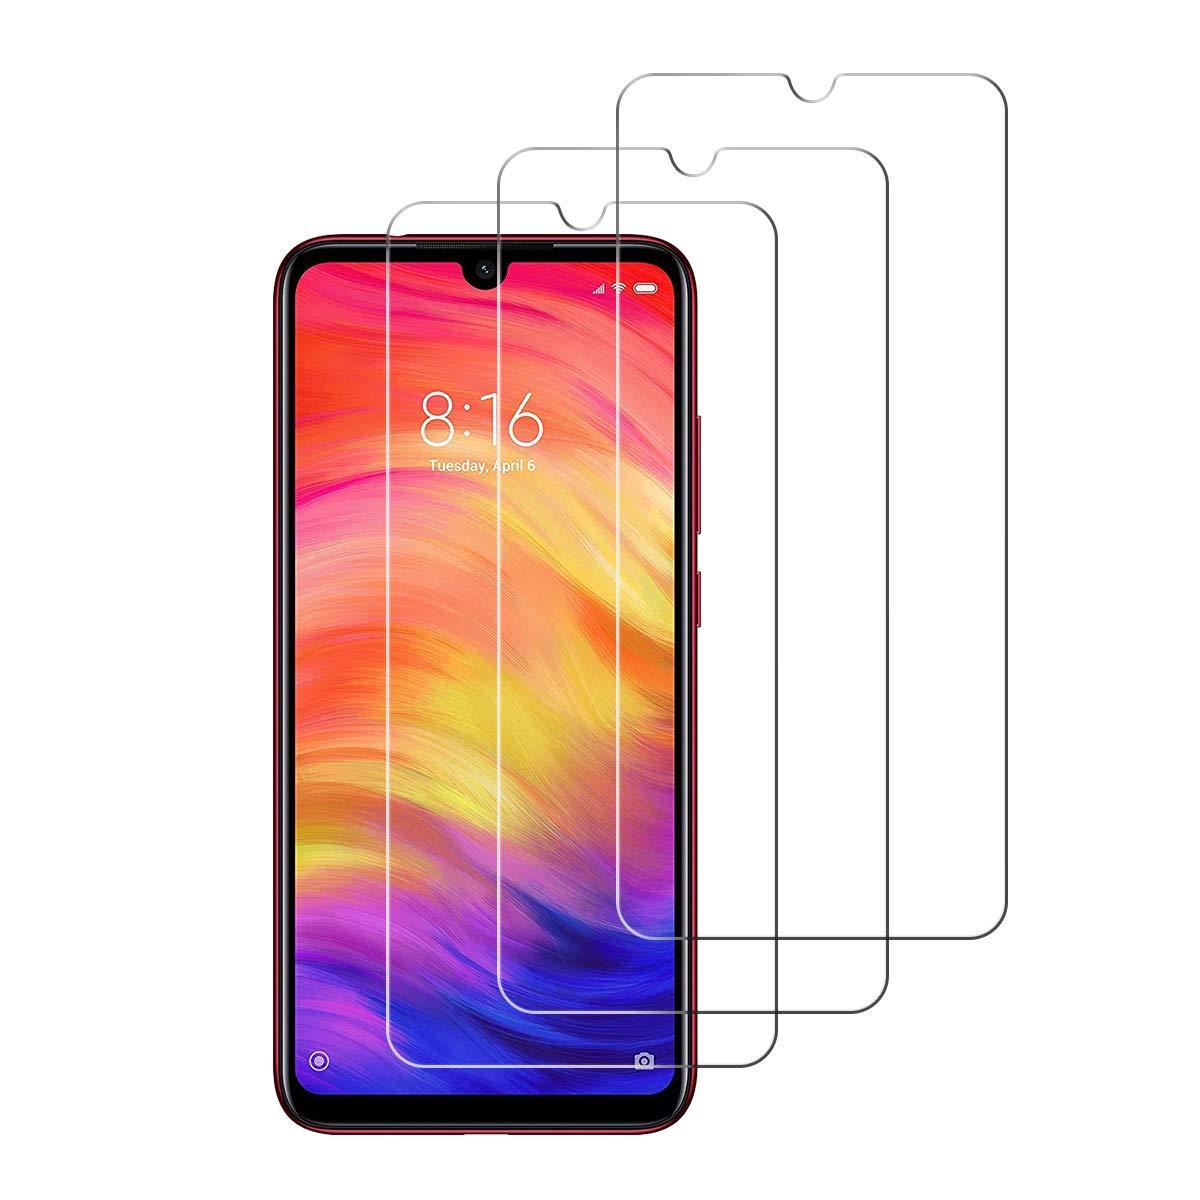 Protector de Pantalla para Xiaomi Redmi Note 7 // Note 7 Pro,Cristal Templado para Xiaomi Redmi Note 7 // Note 7 Pro Alta Definicion,9H Dureza,Sin Burbujas iDolix Transparente 3 Unidades